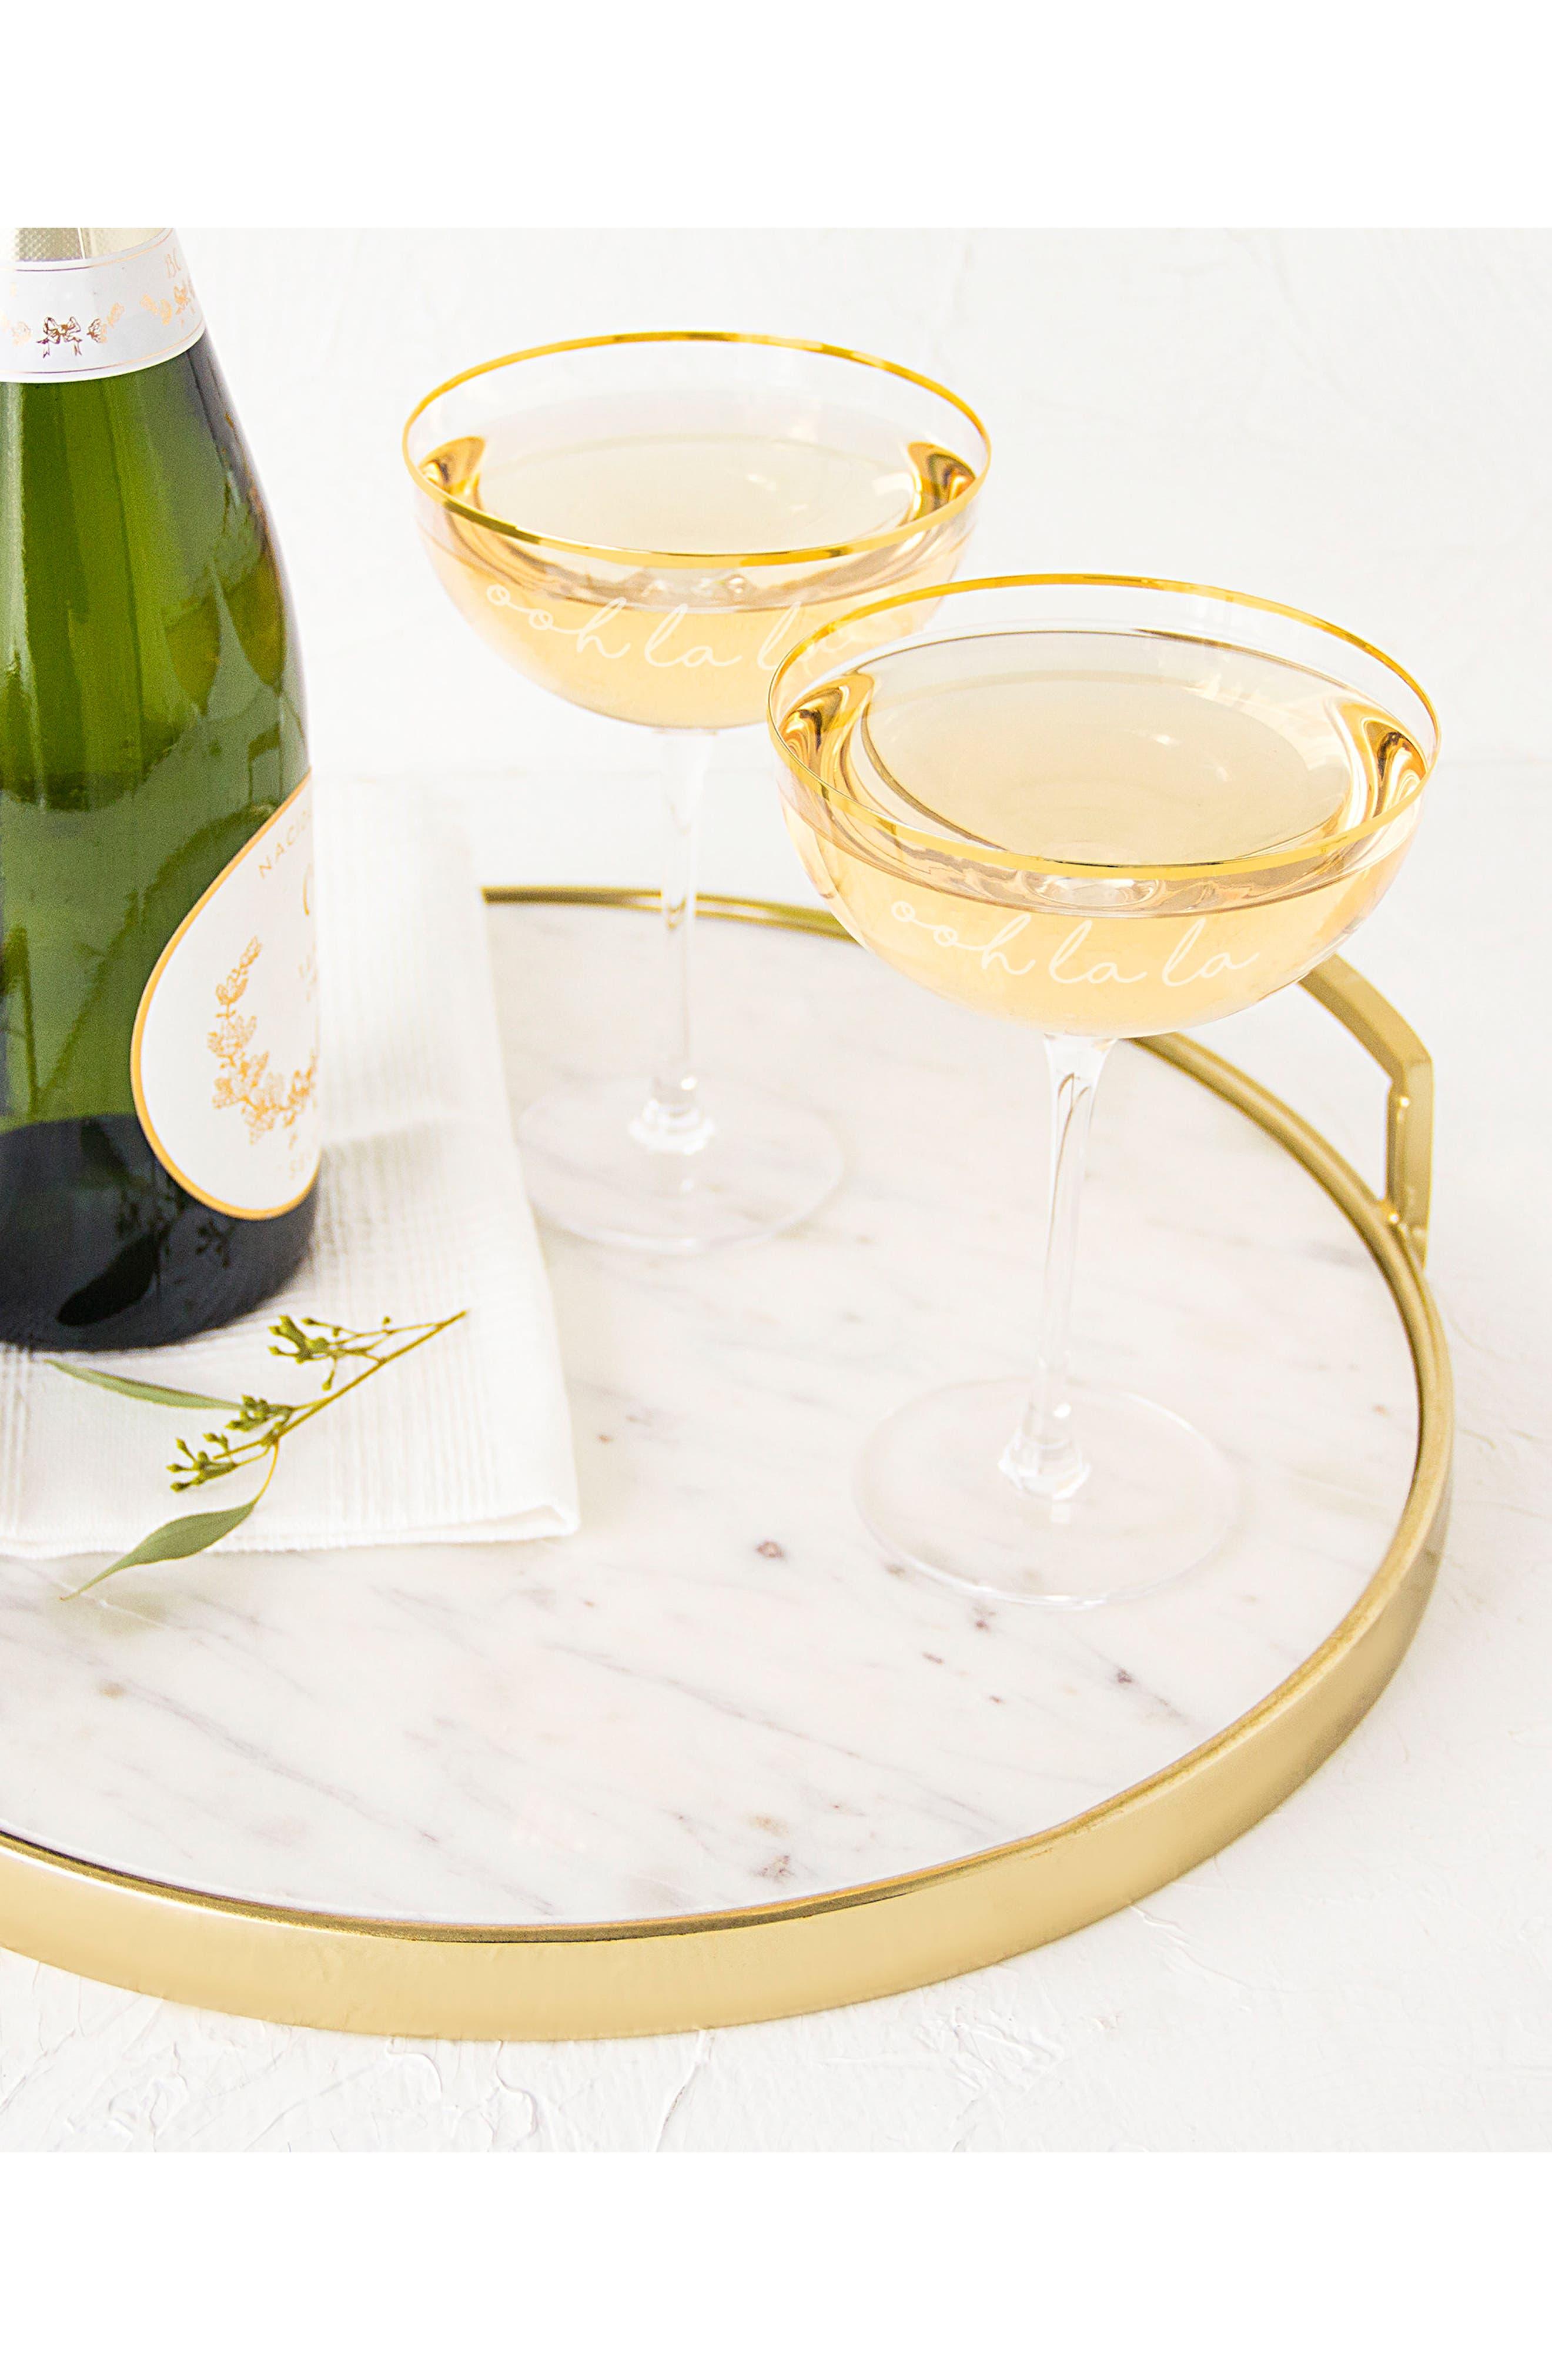 Ooh La La Set of 2 Champagne Coupes,                             Alternate thumbnail 4, color,                             100